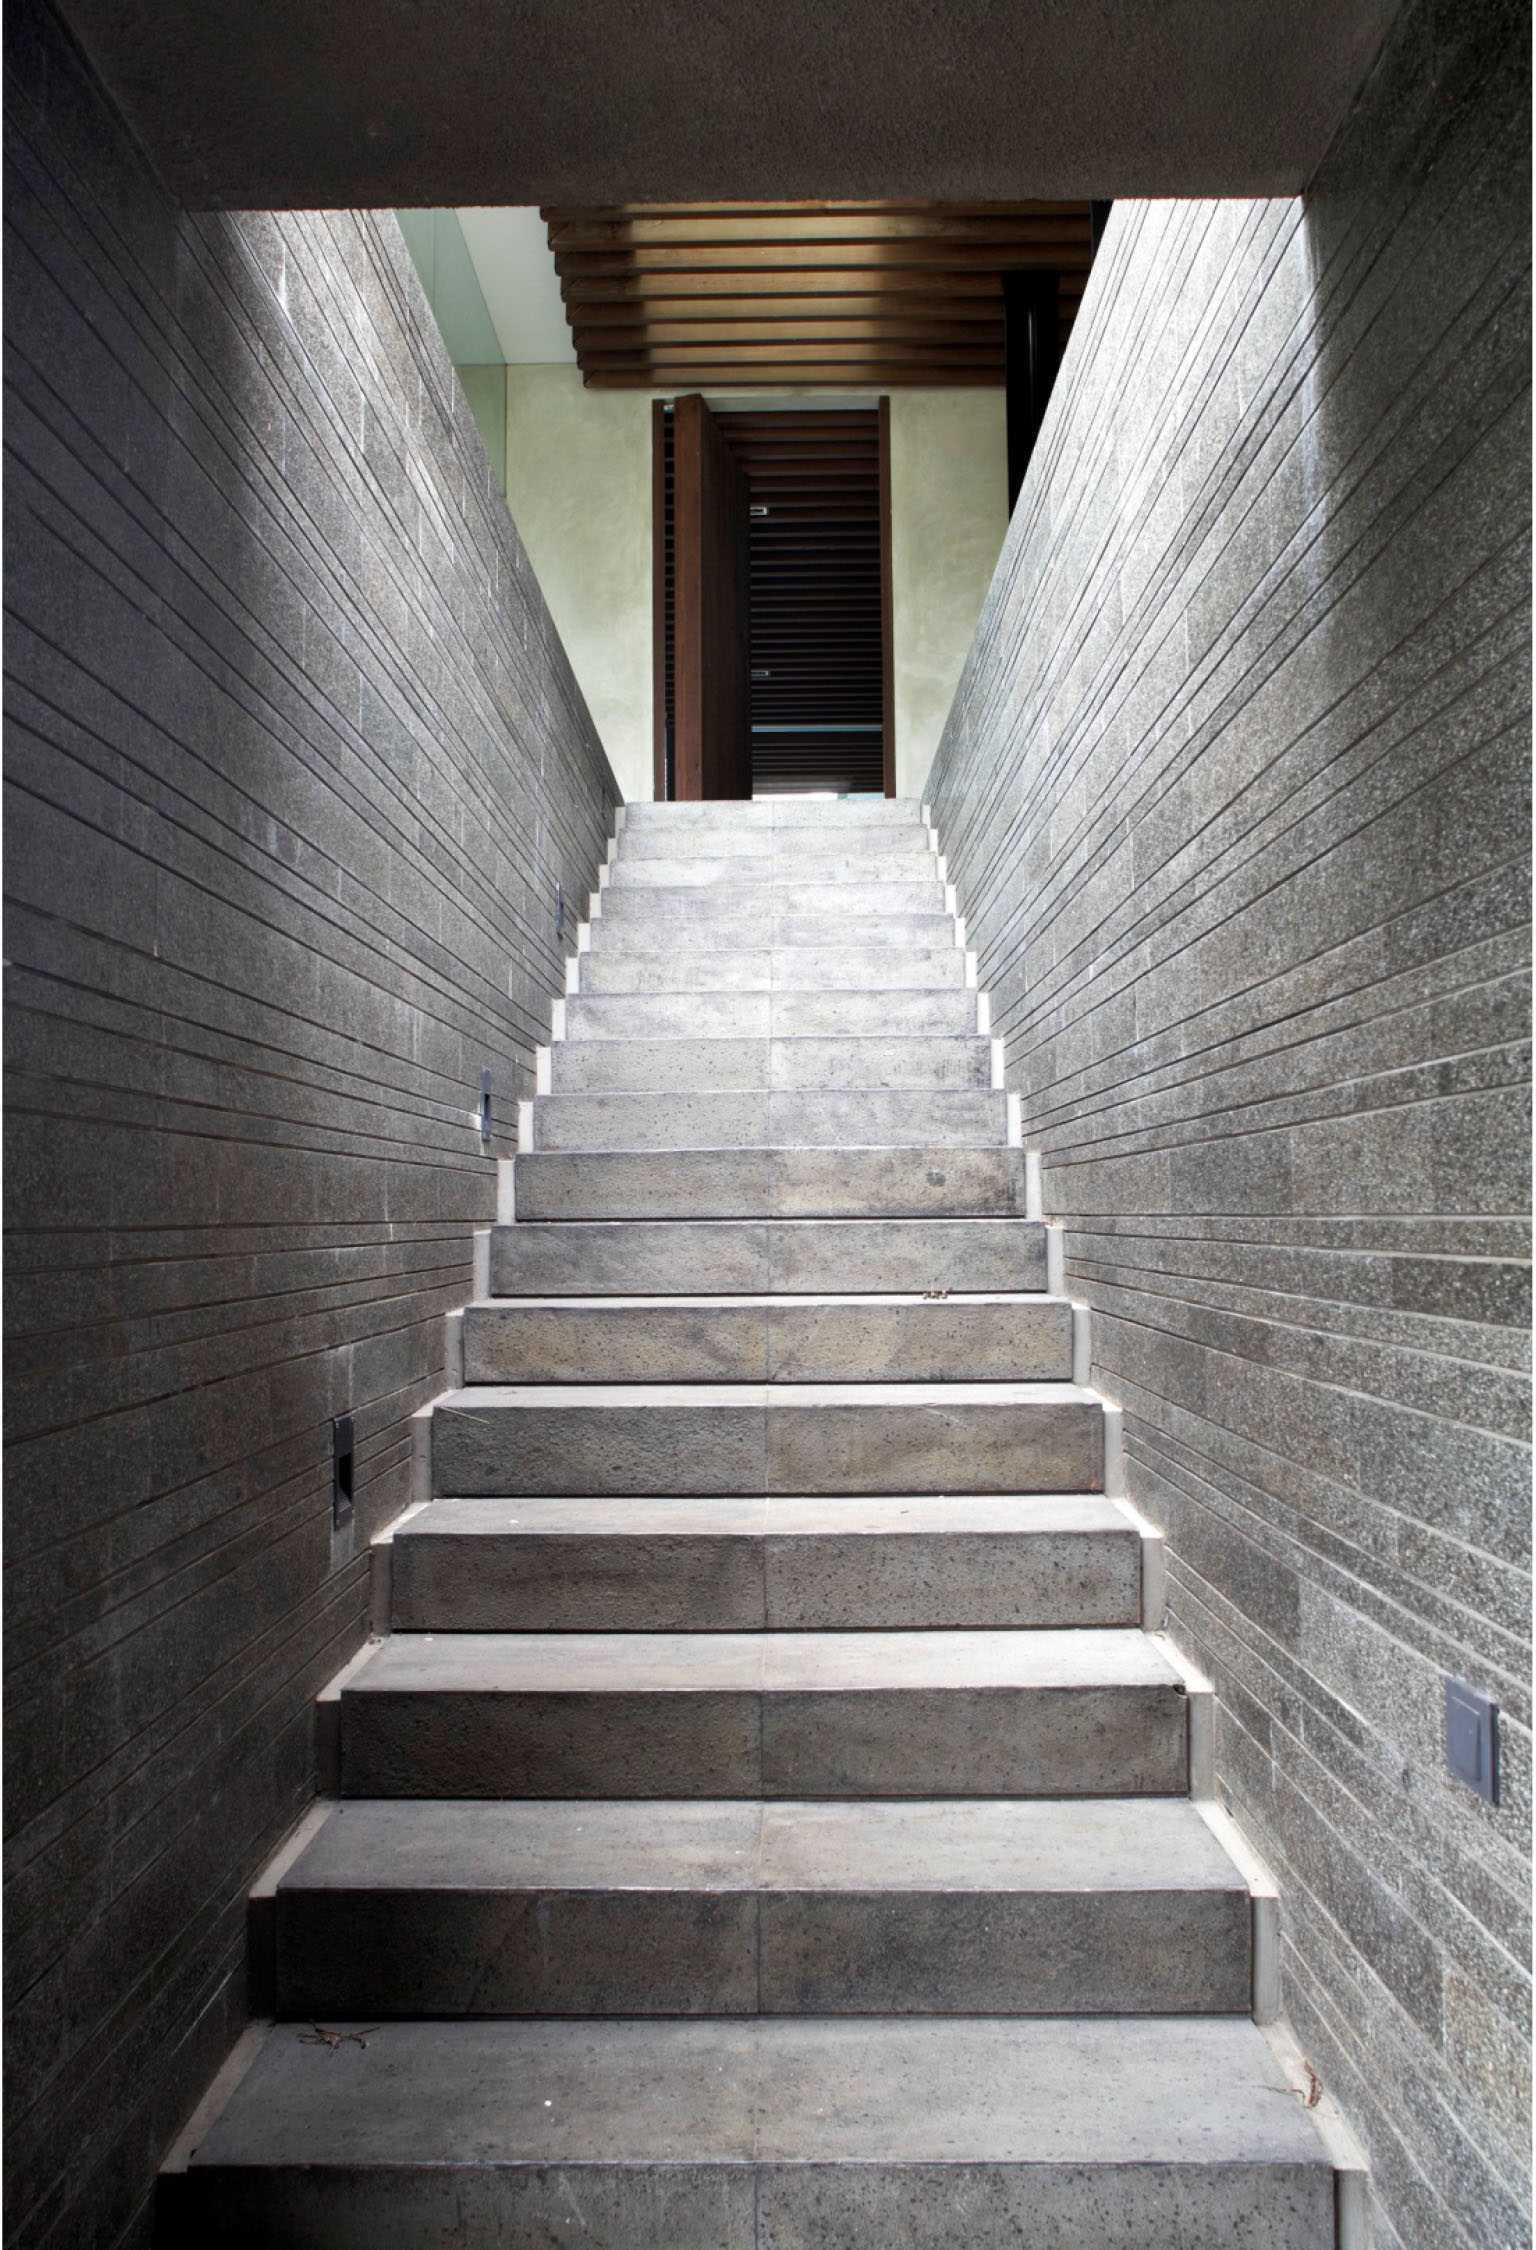 Studio Air Putih W_House Tulodong, Jakarta Tulodong, Jakarta Stairs View   25168